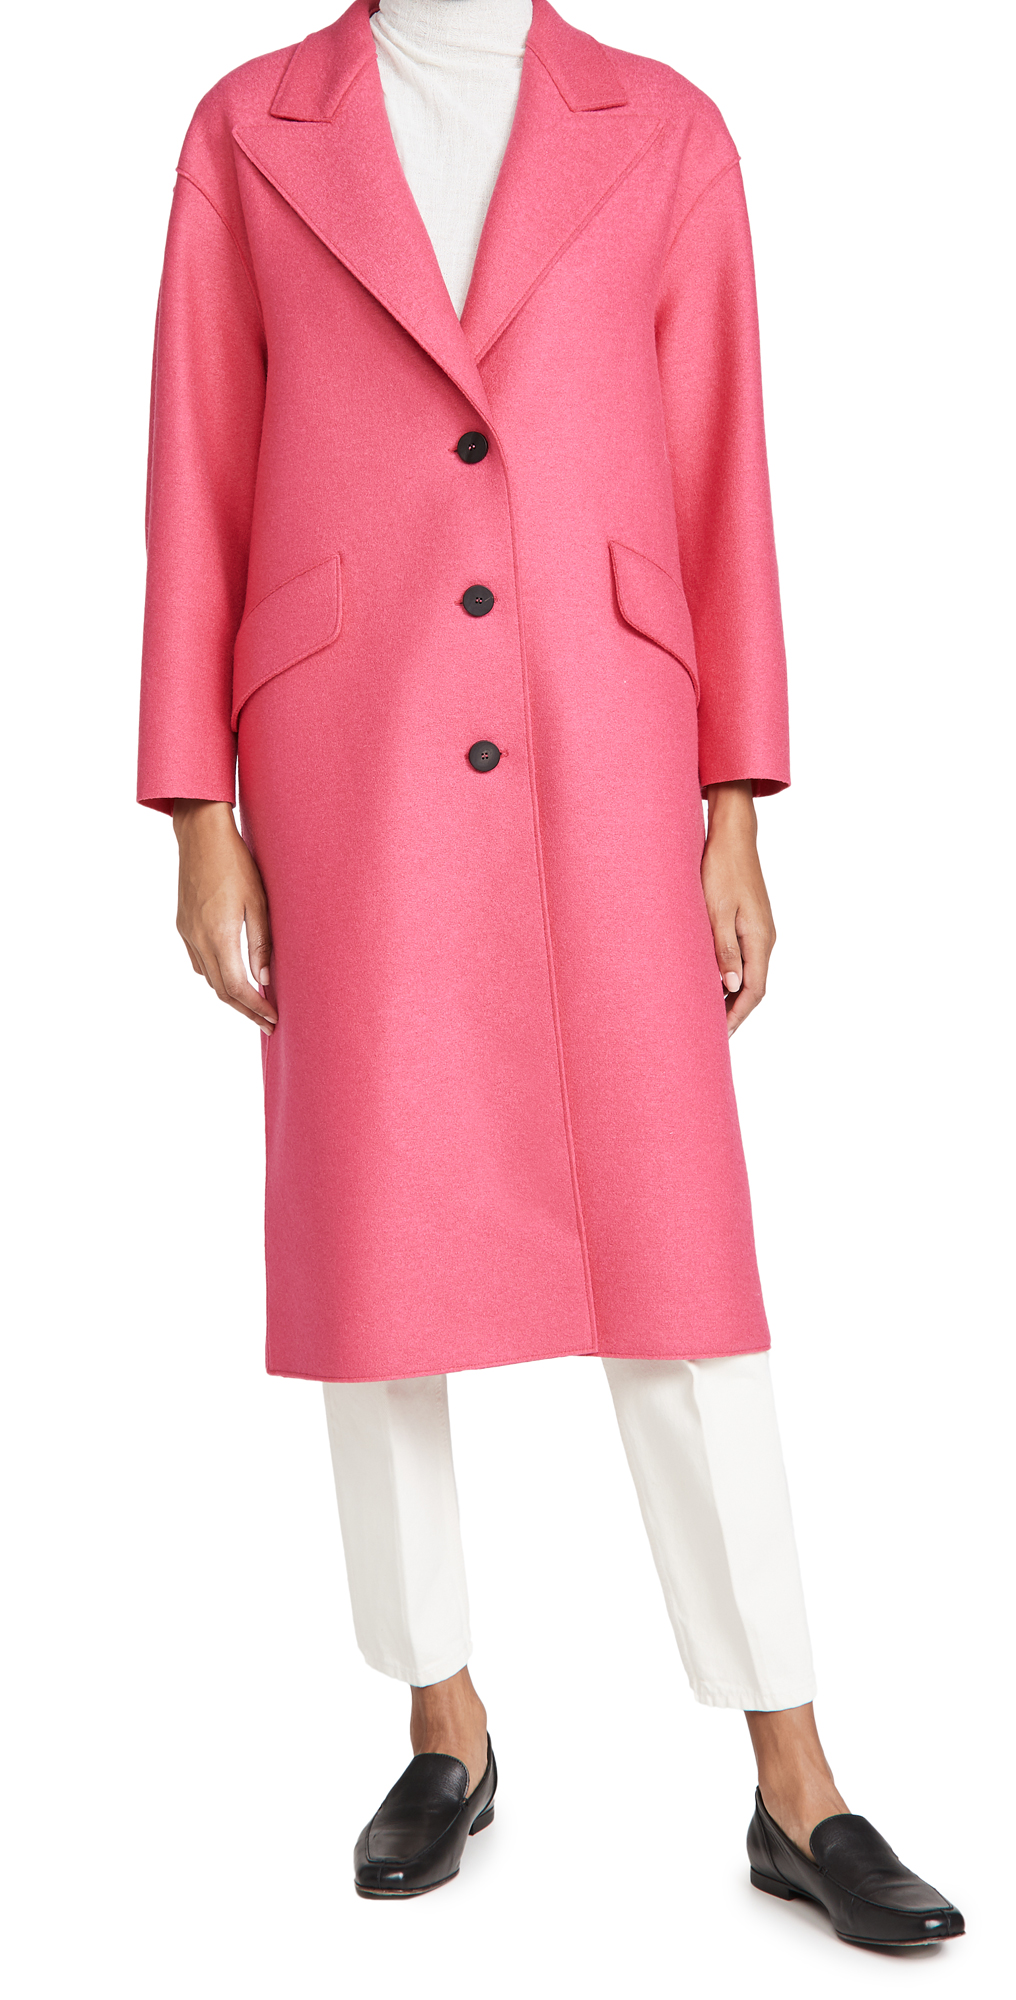 Harris Wharf London Pressed Wool Great Coat